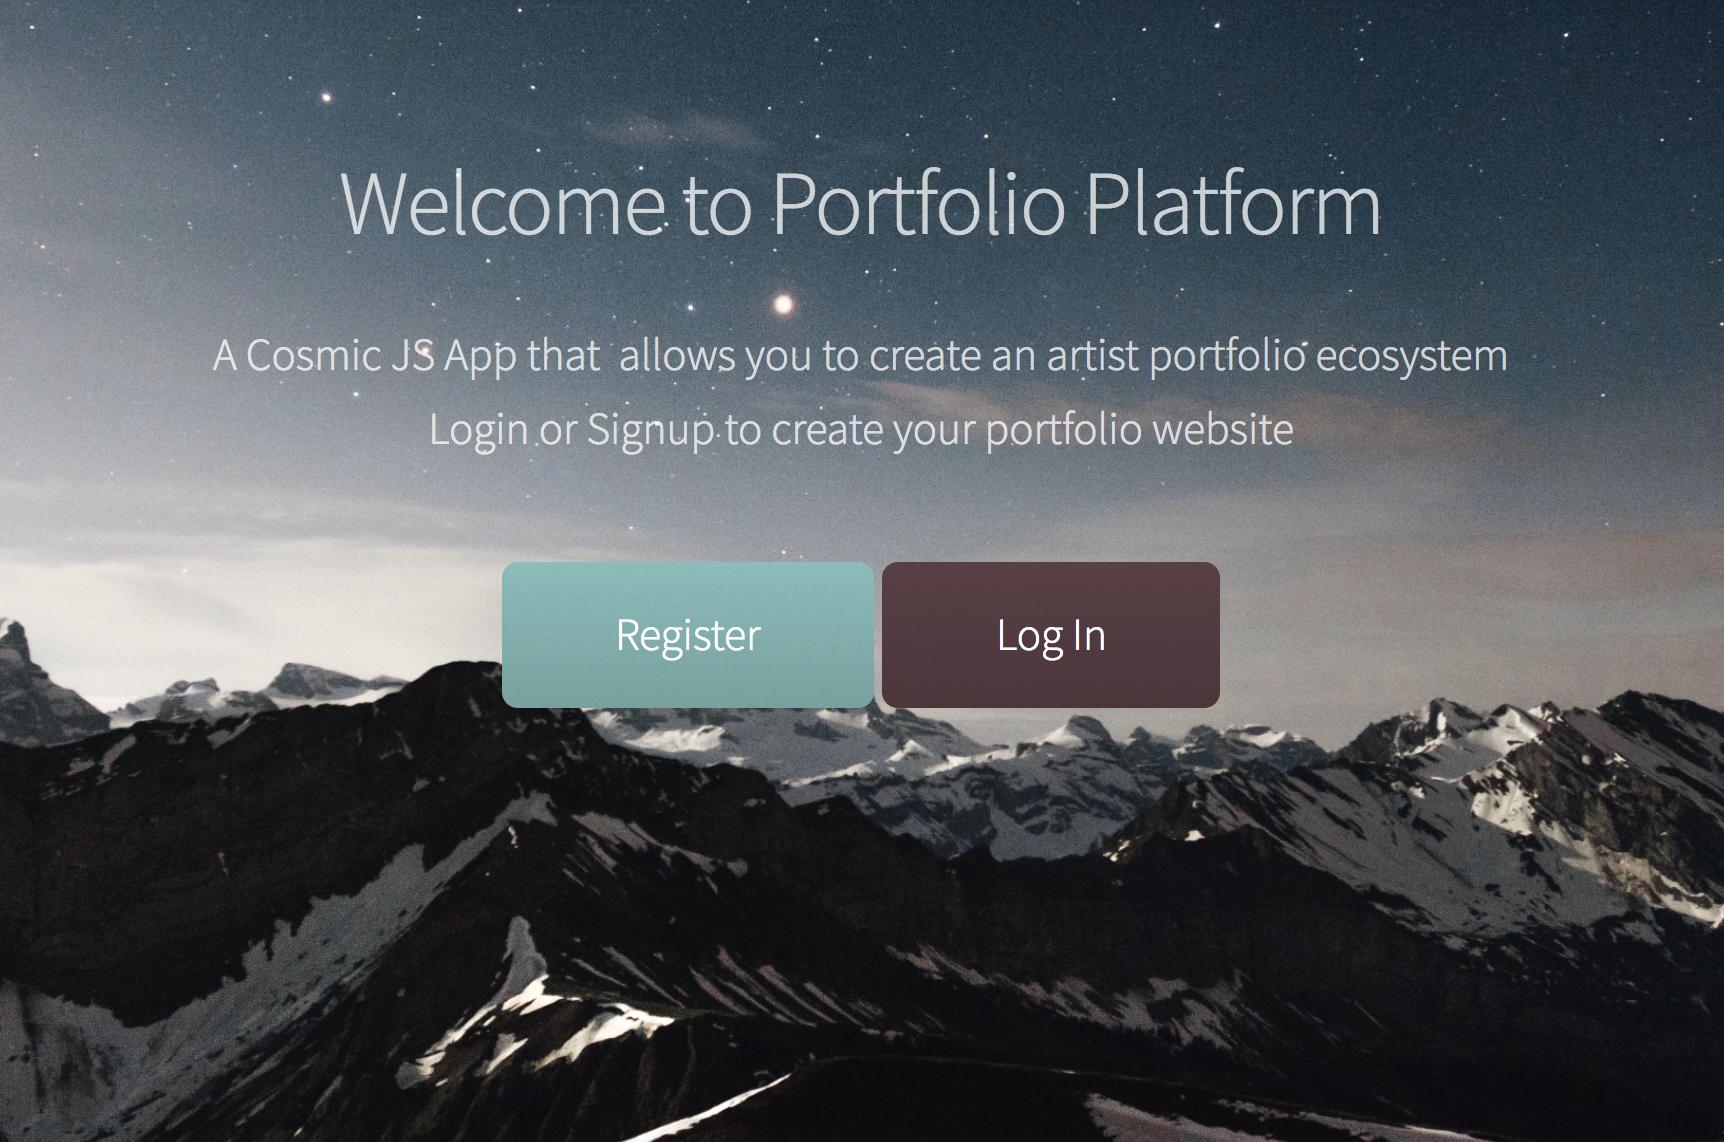 /deploy-a-portfolio-platform-app-in-3-steps-using-cosmic-js-3f664f5bb82c feature image